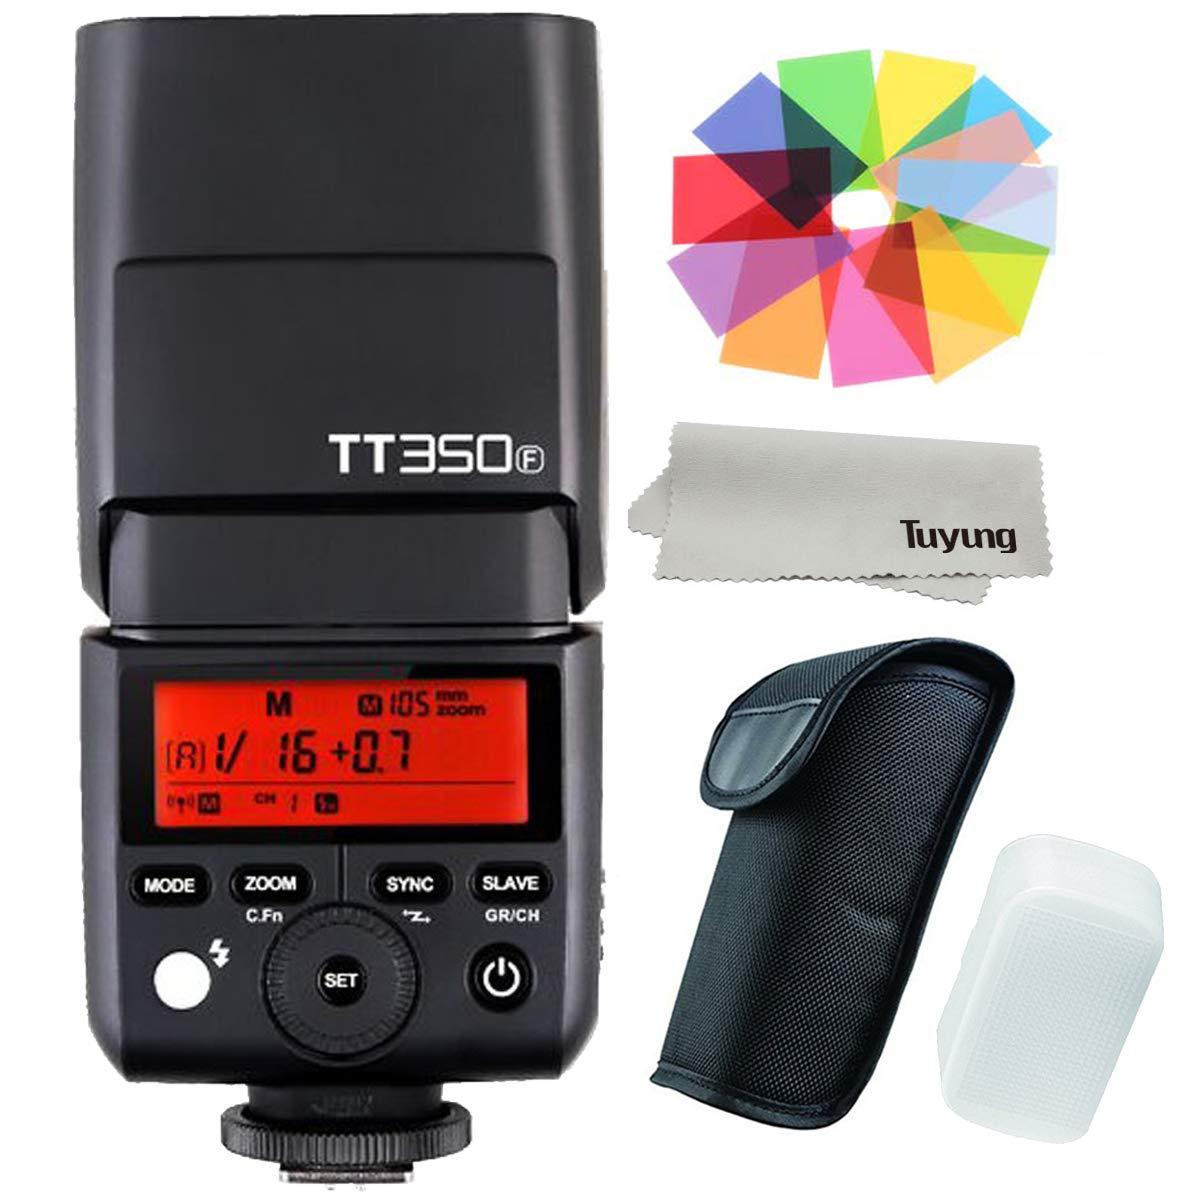 Godox tt350 F 2.4 G HSS 1 / 8000s TTL gn36カメラフラッシュSpeedlite for Fujiカメラx-pro2、x-t20、x-t2 , X - t1 , X - pro1 , x-t10、x-e1、x-a3、x100 F , x100t   B0721JLKM4